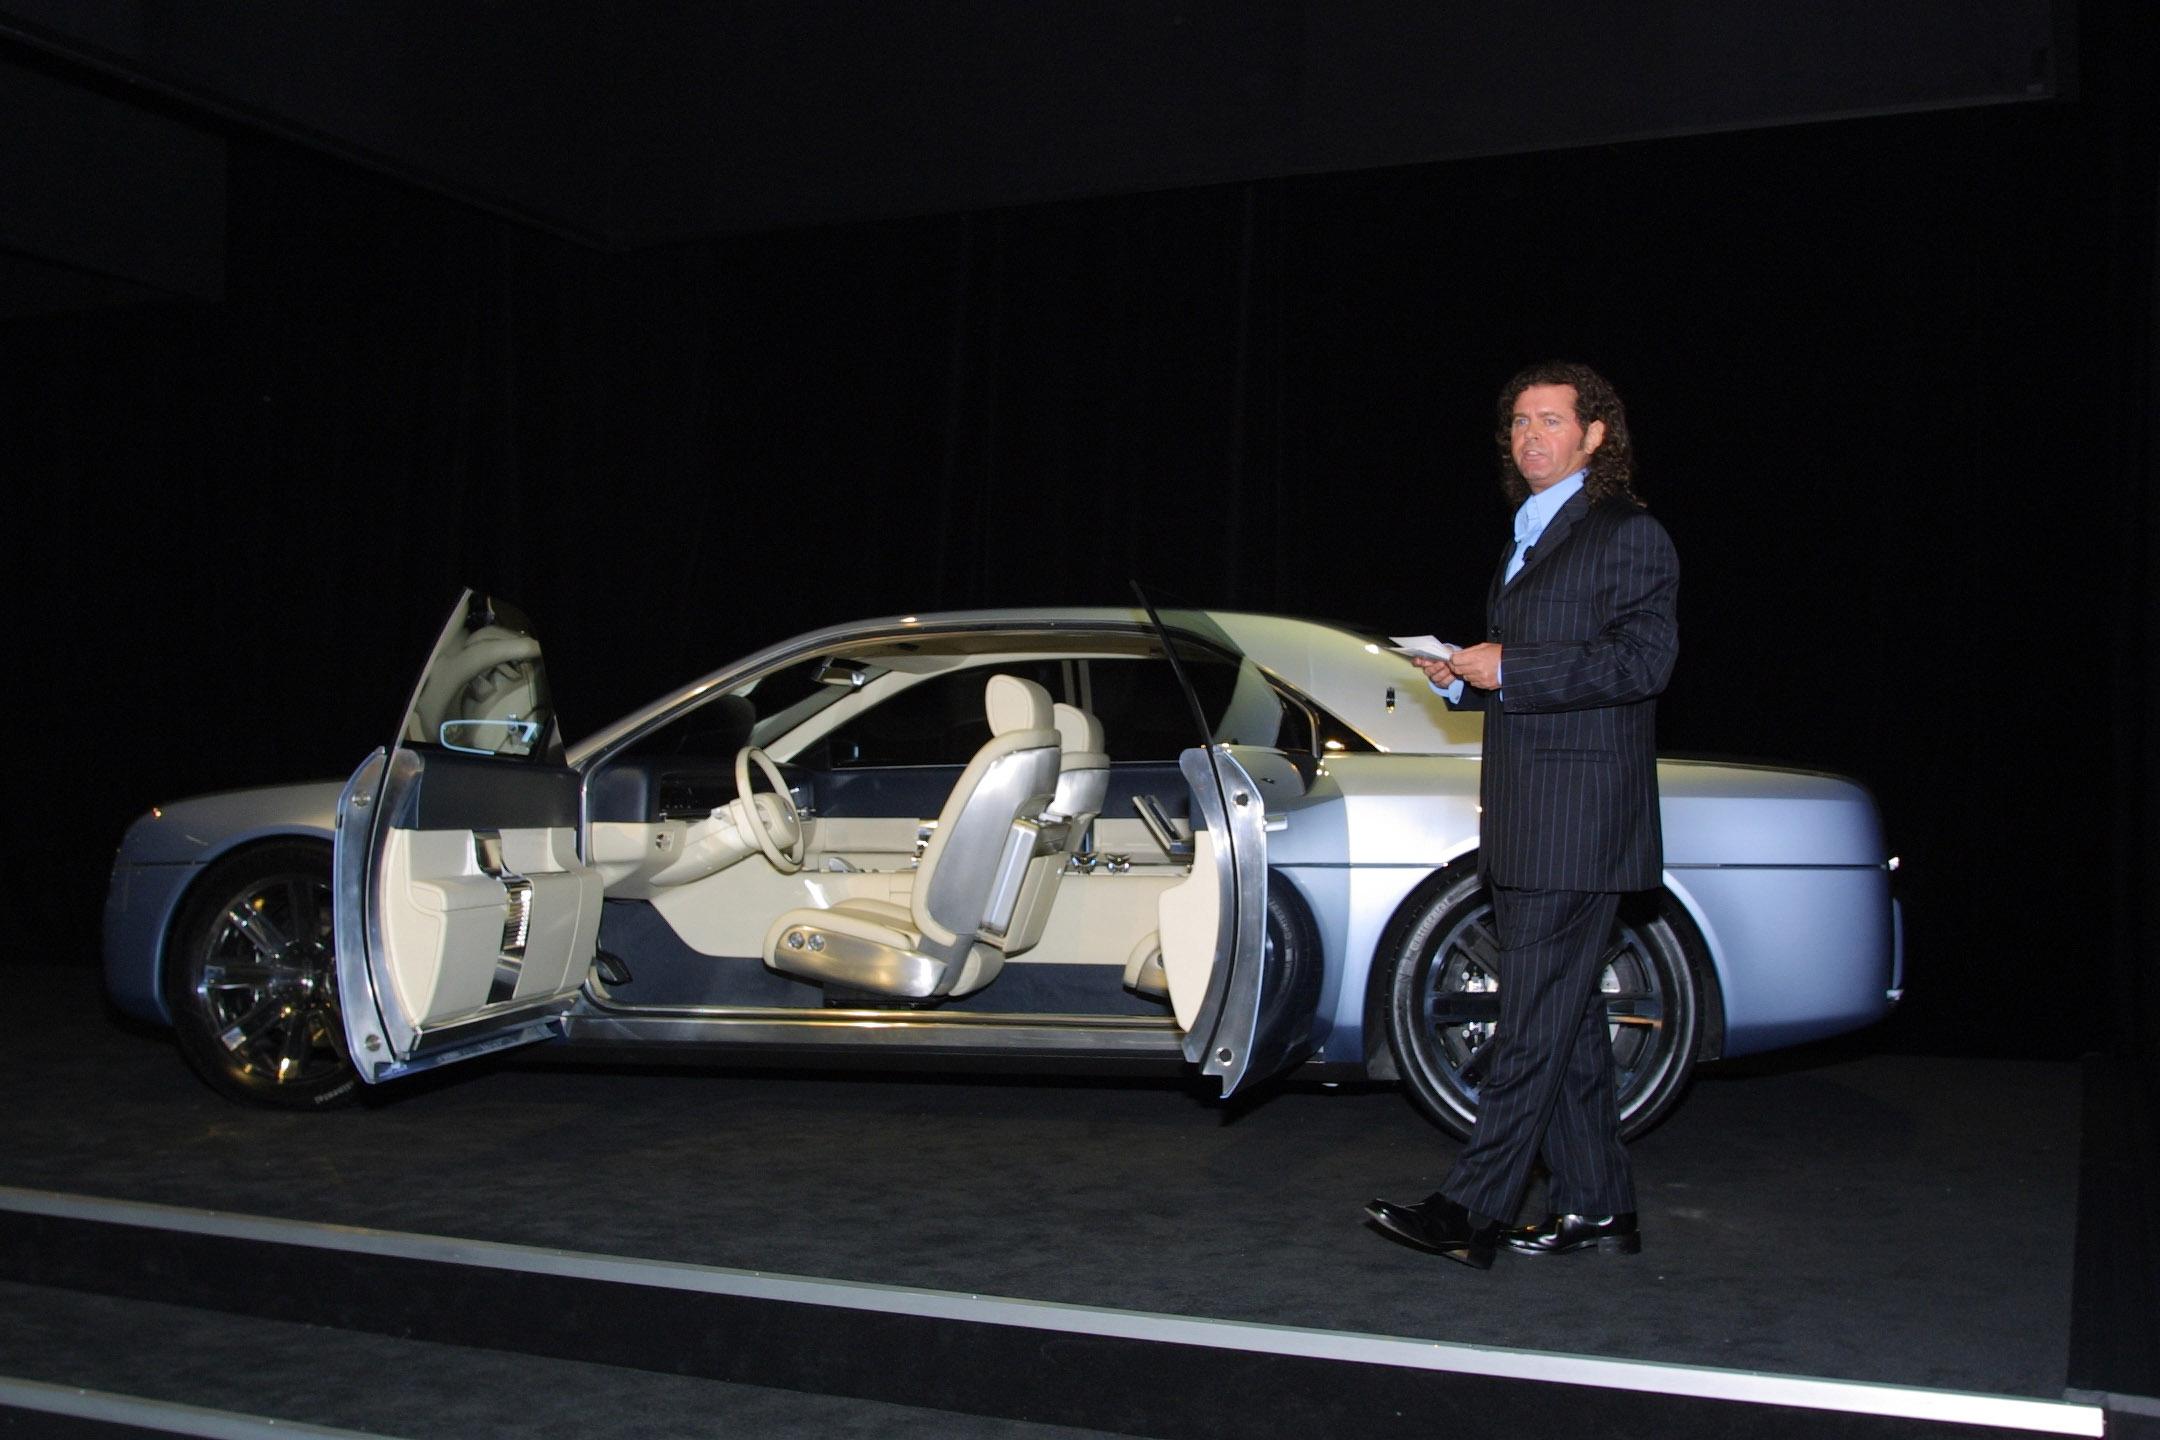 Lincoln Continental Concept - Picture 31673